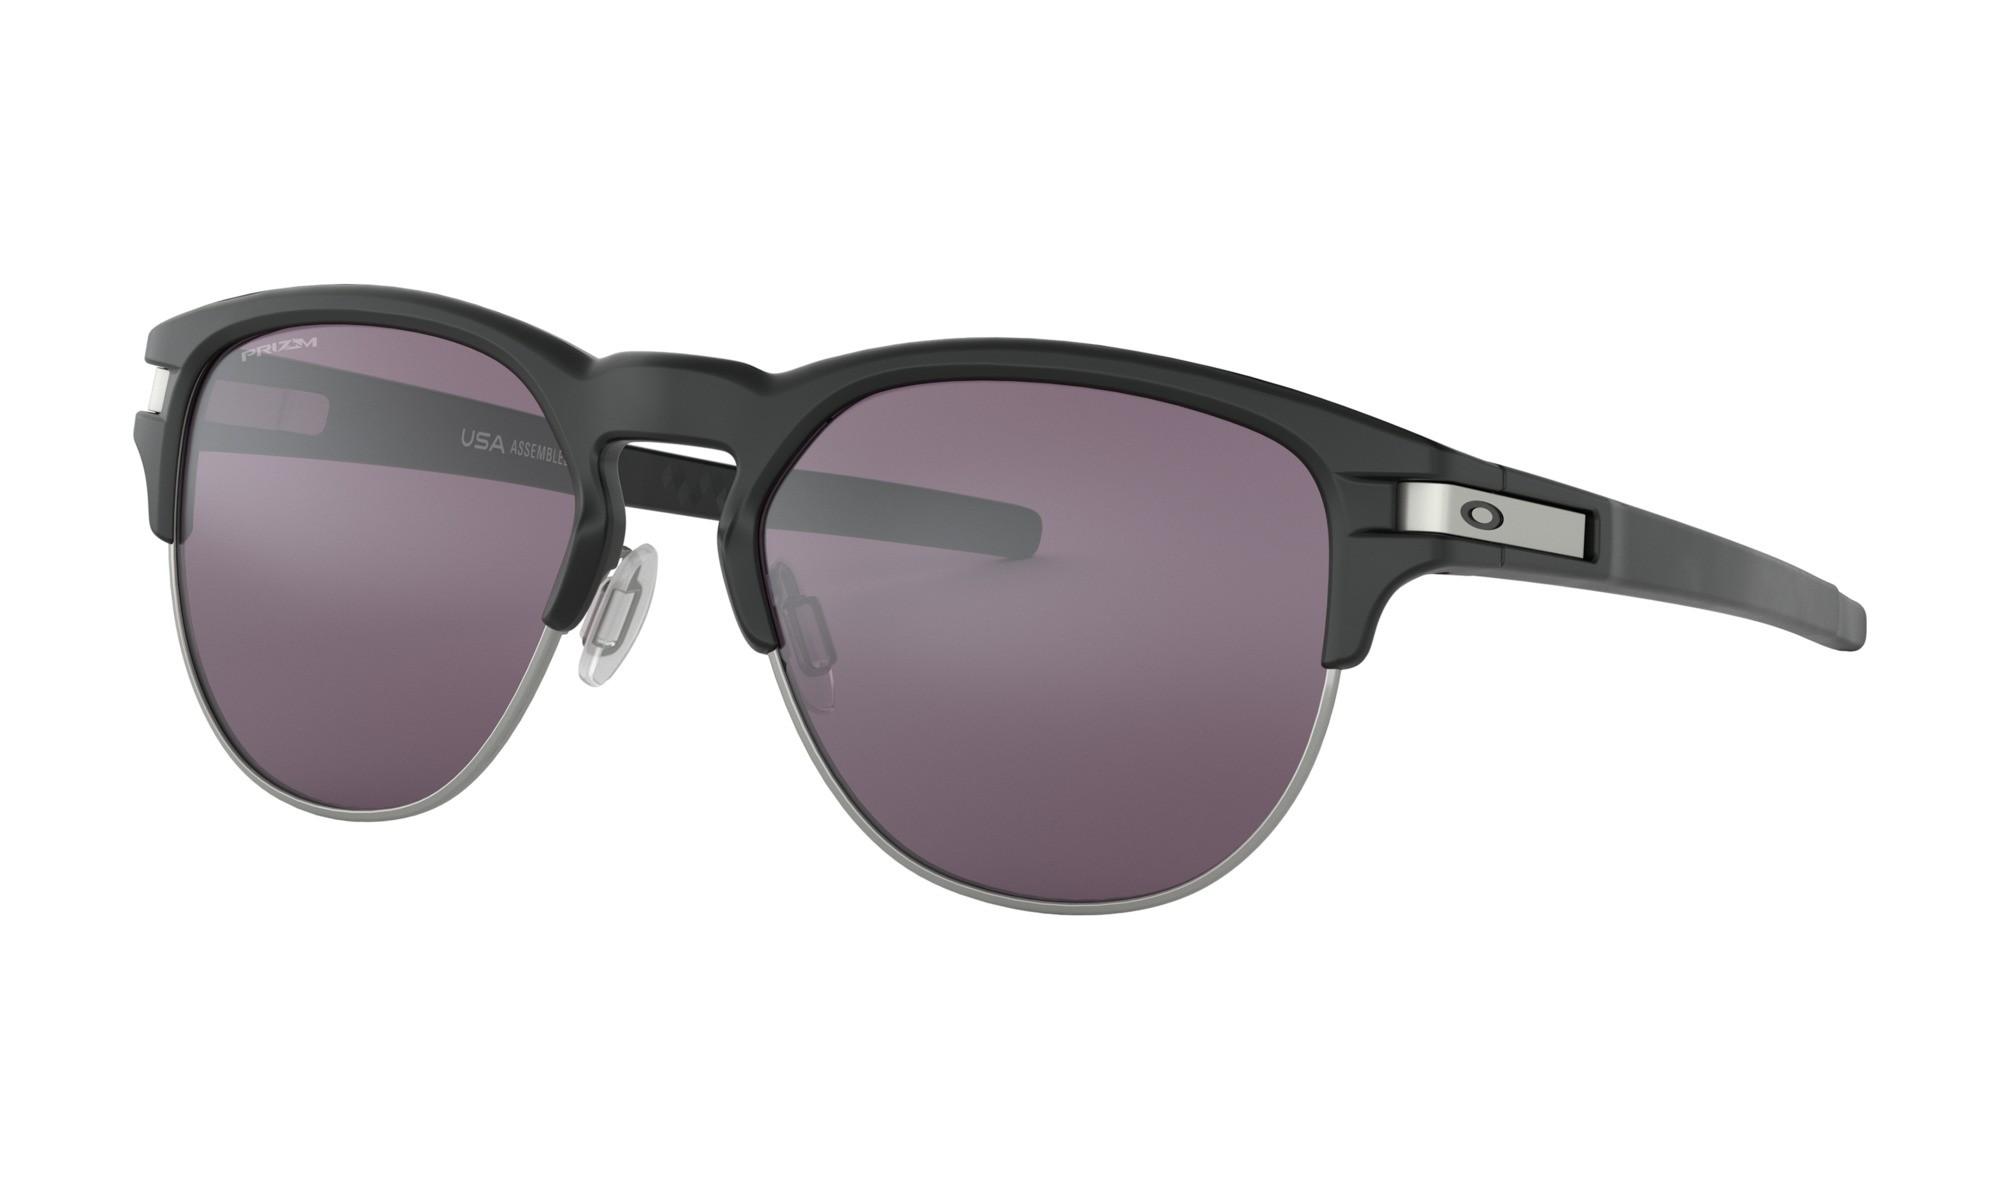 97b49d1eaf Oakley Latch Key M Matte Black Prizm Gray Sunglasses